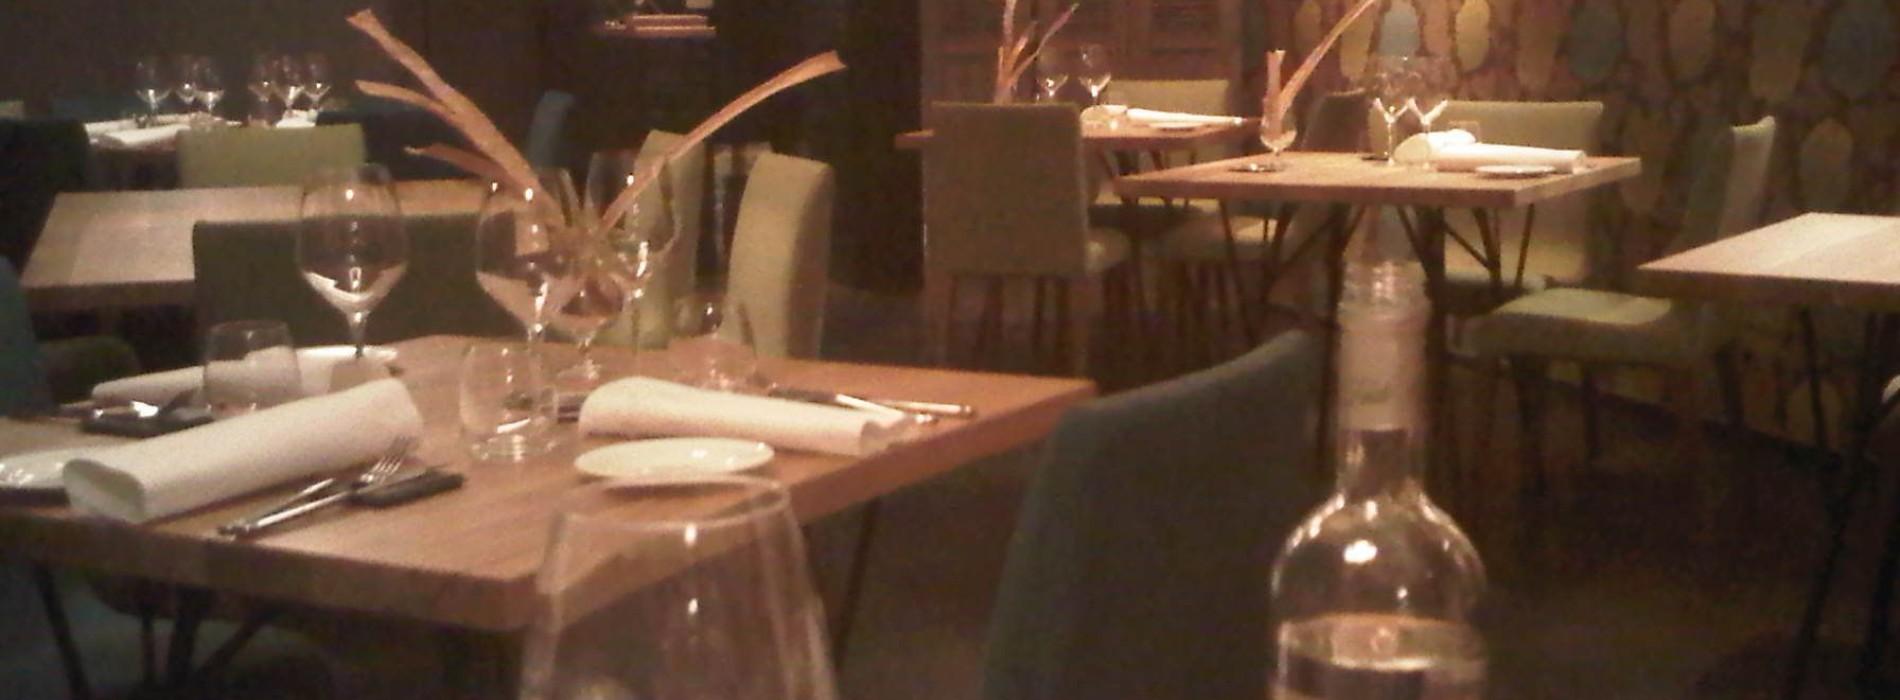 Casa Coppola Roma Rm casa coppola, debutto con ostriche